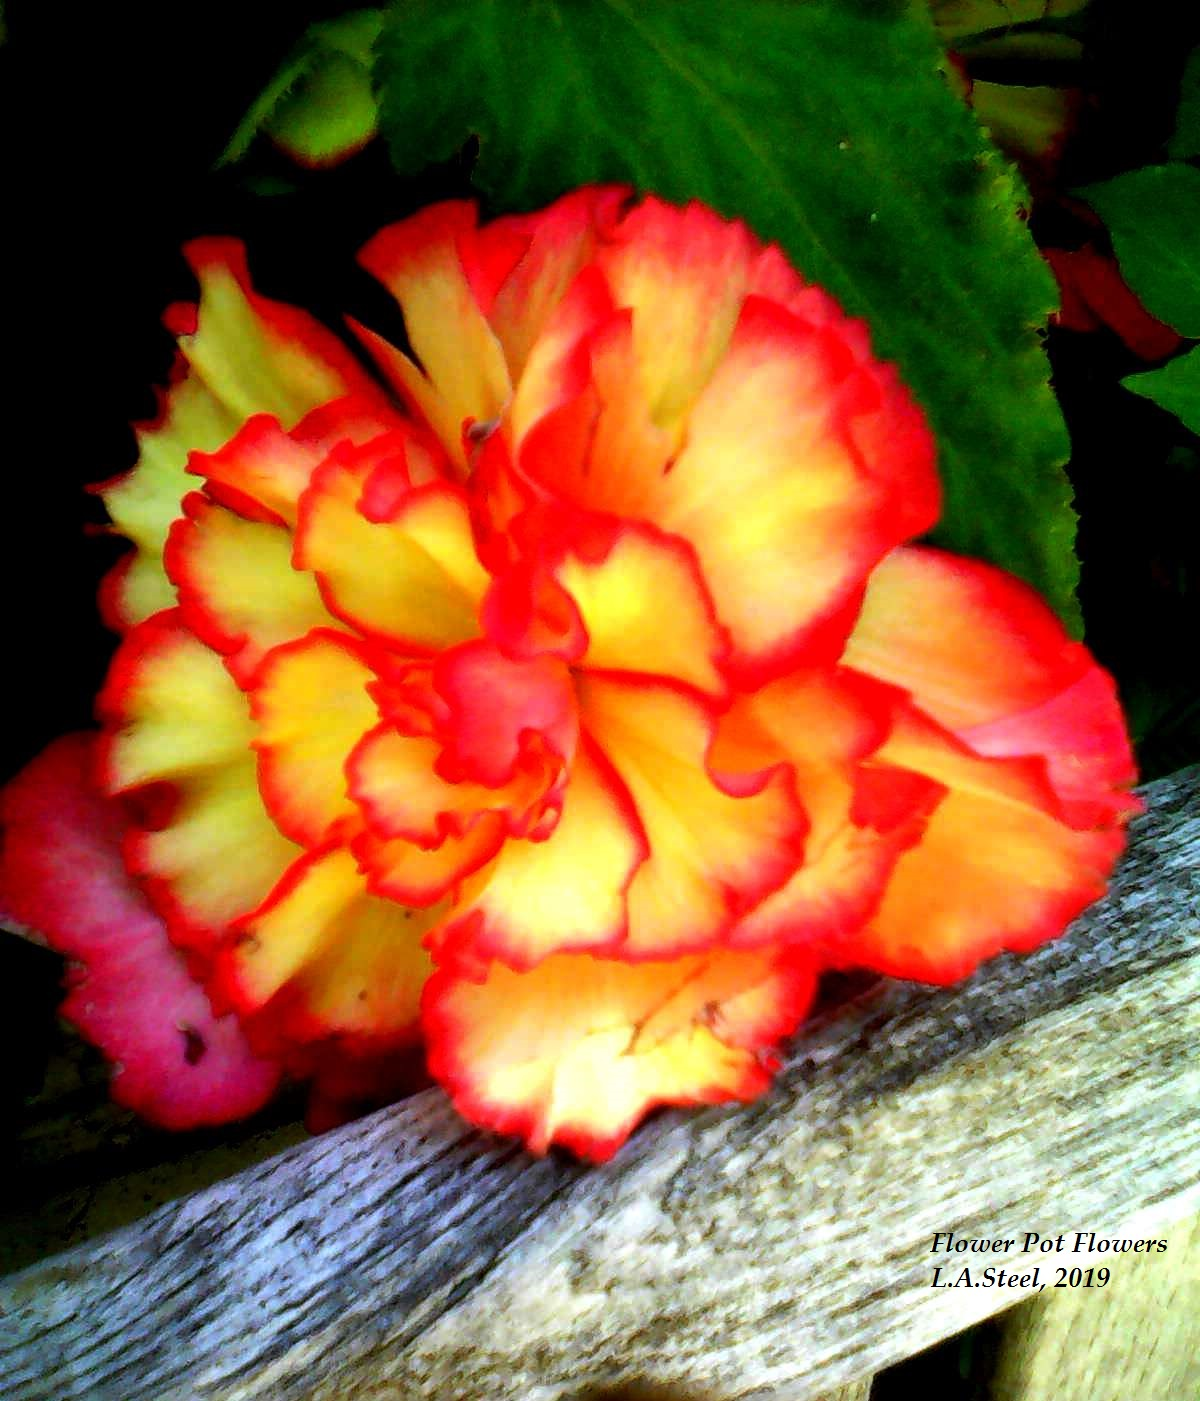 flower pot flowers 4 2019